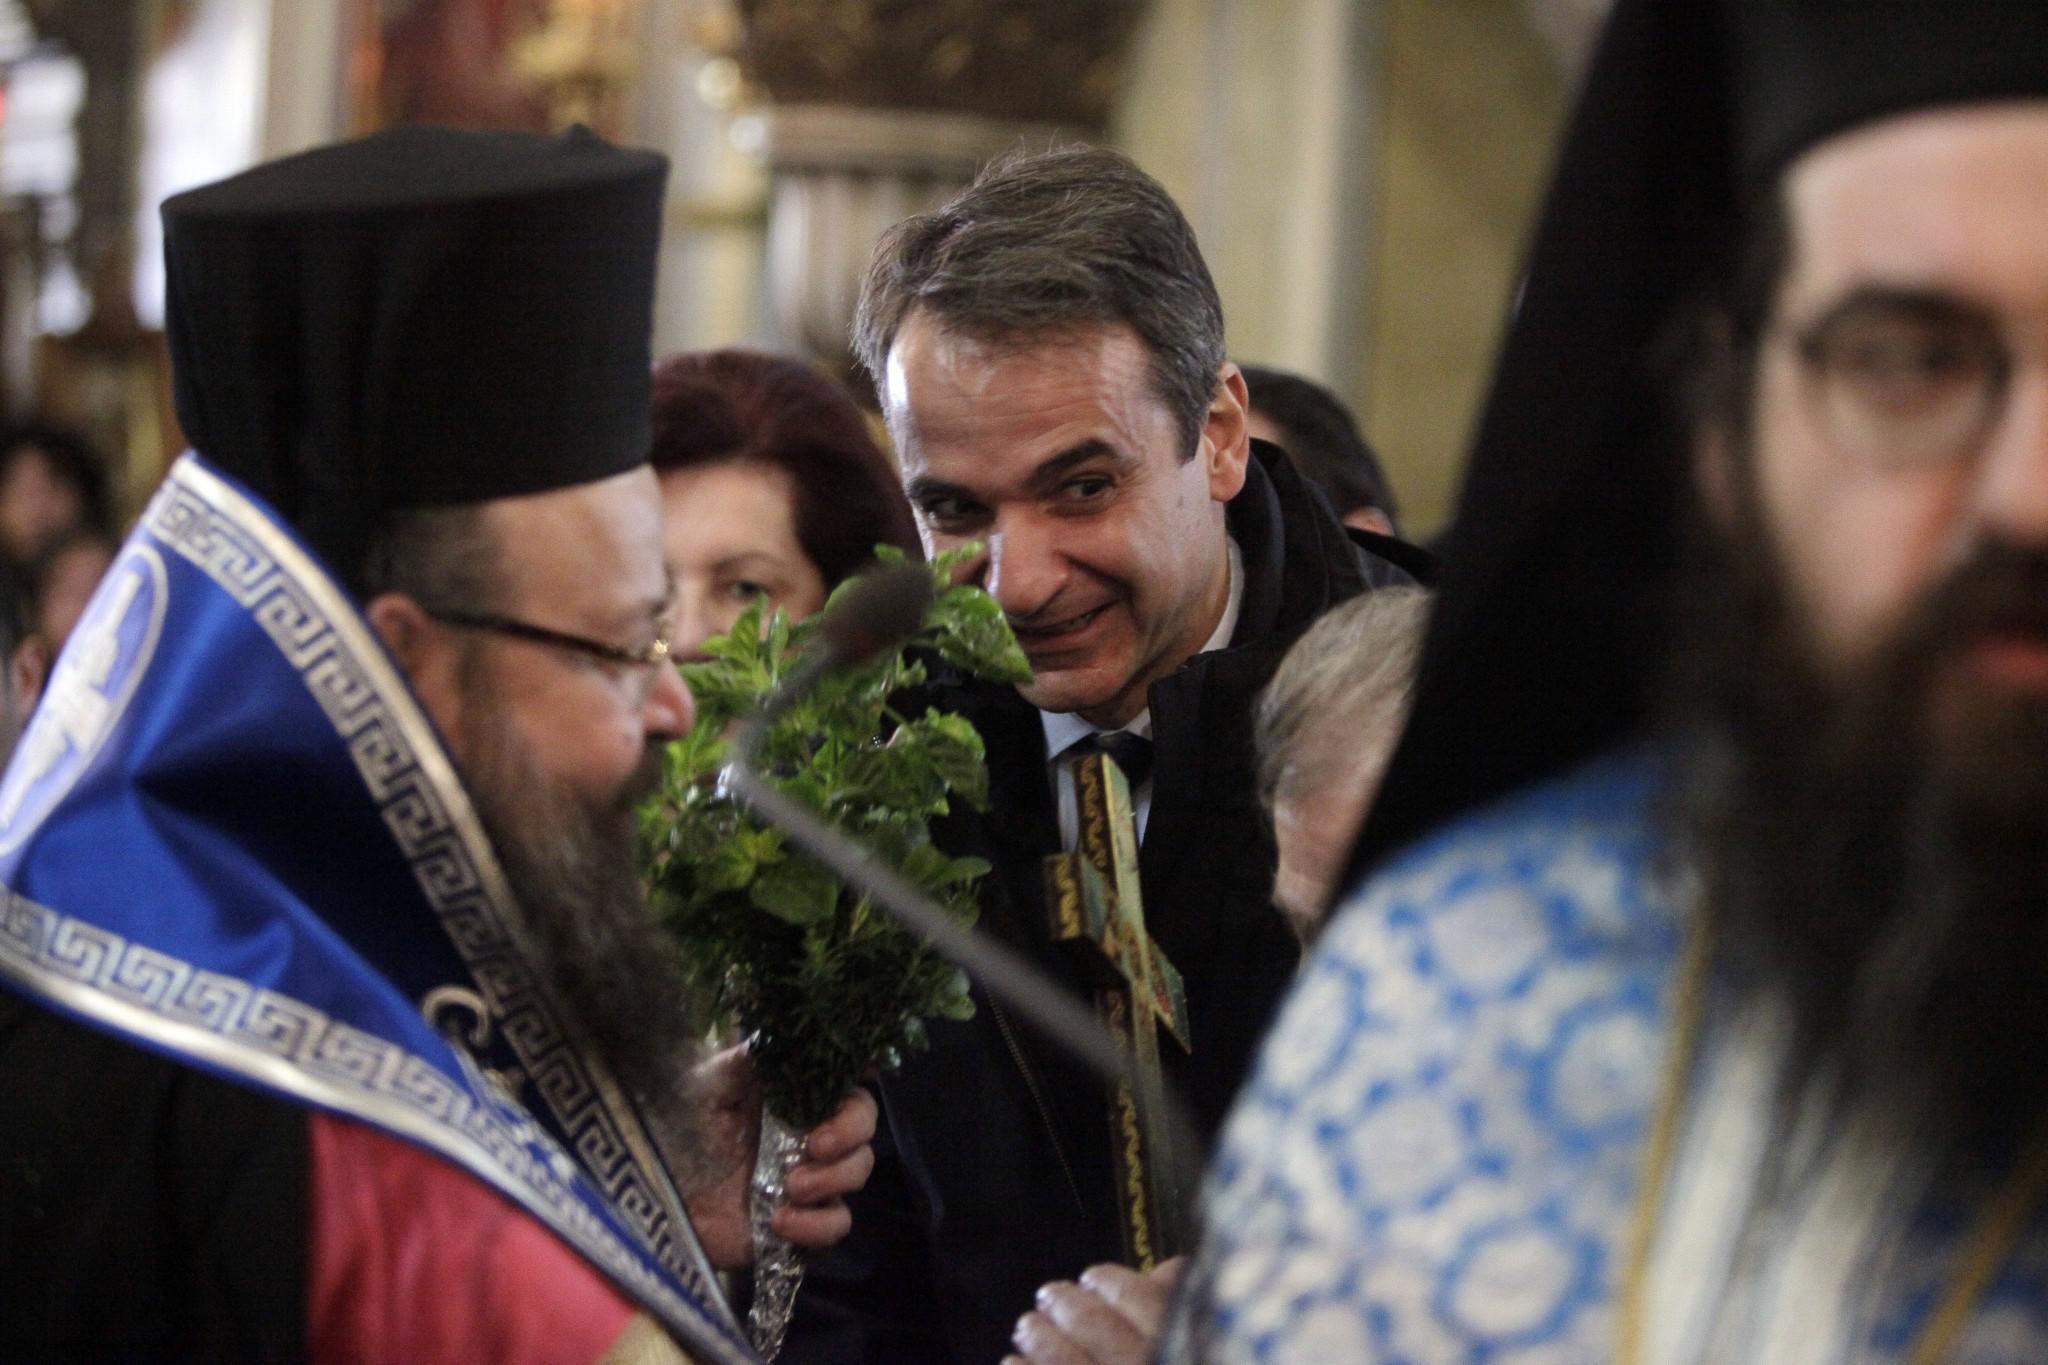 mitsotakis3-500 Μητσοτάκης: Είναι άμεση η ανάγκη για ενότητα [εικόνες]